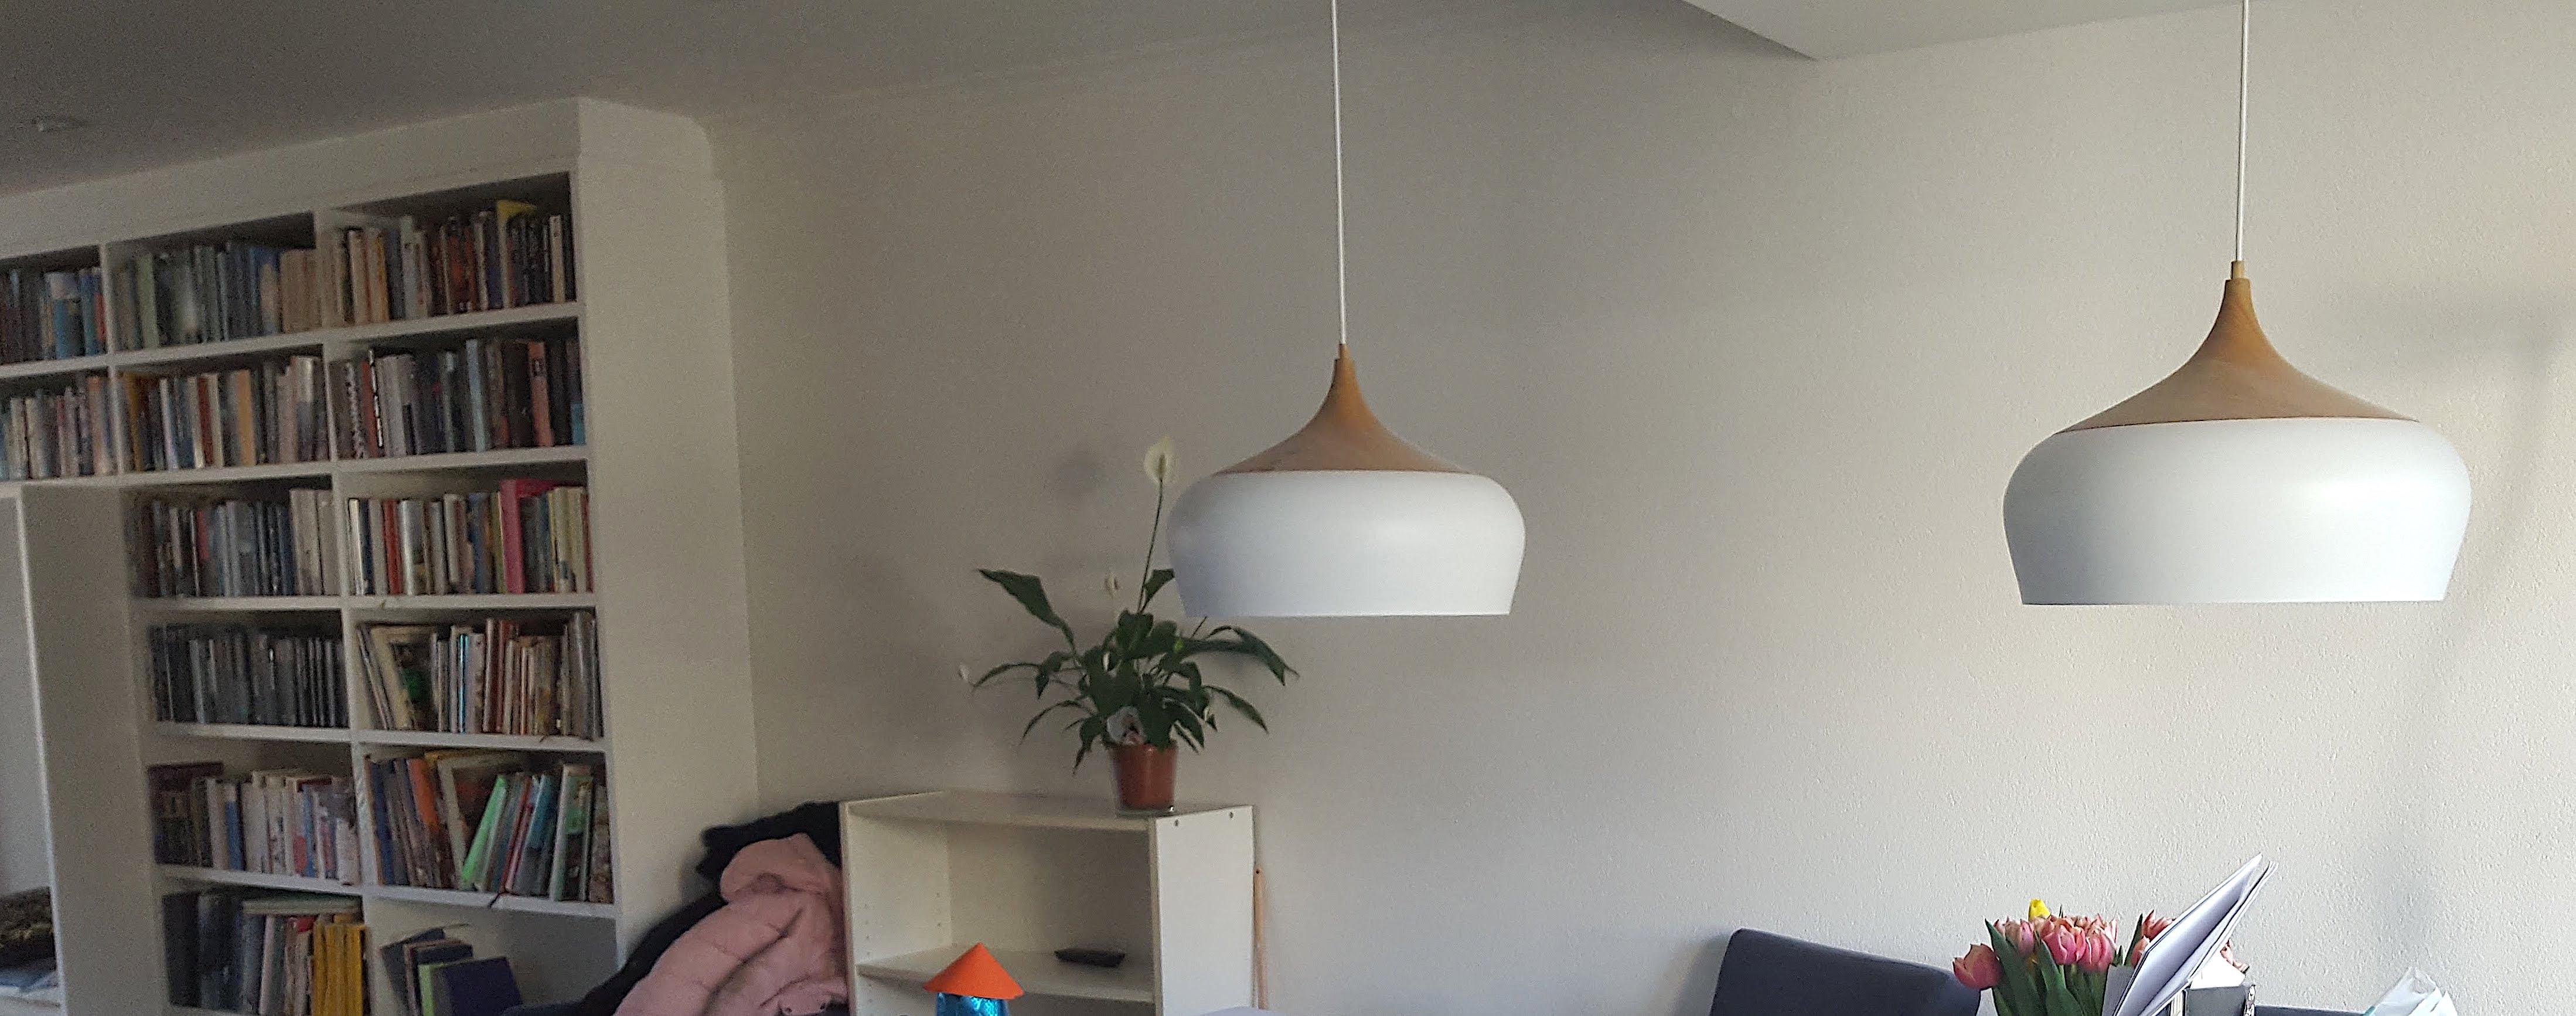 https://www.studio-leegwater.nl/wp-content/uploads/2018/04/Eetkamerlampen-2-onder-1-kapwoning-Noord-Holland.jpg